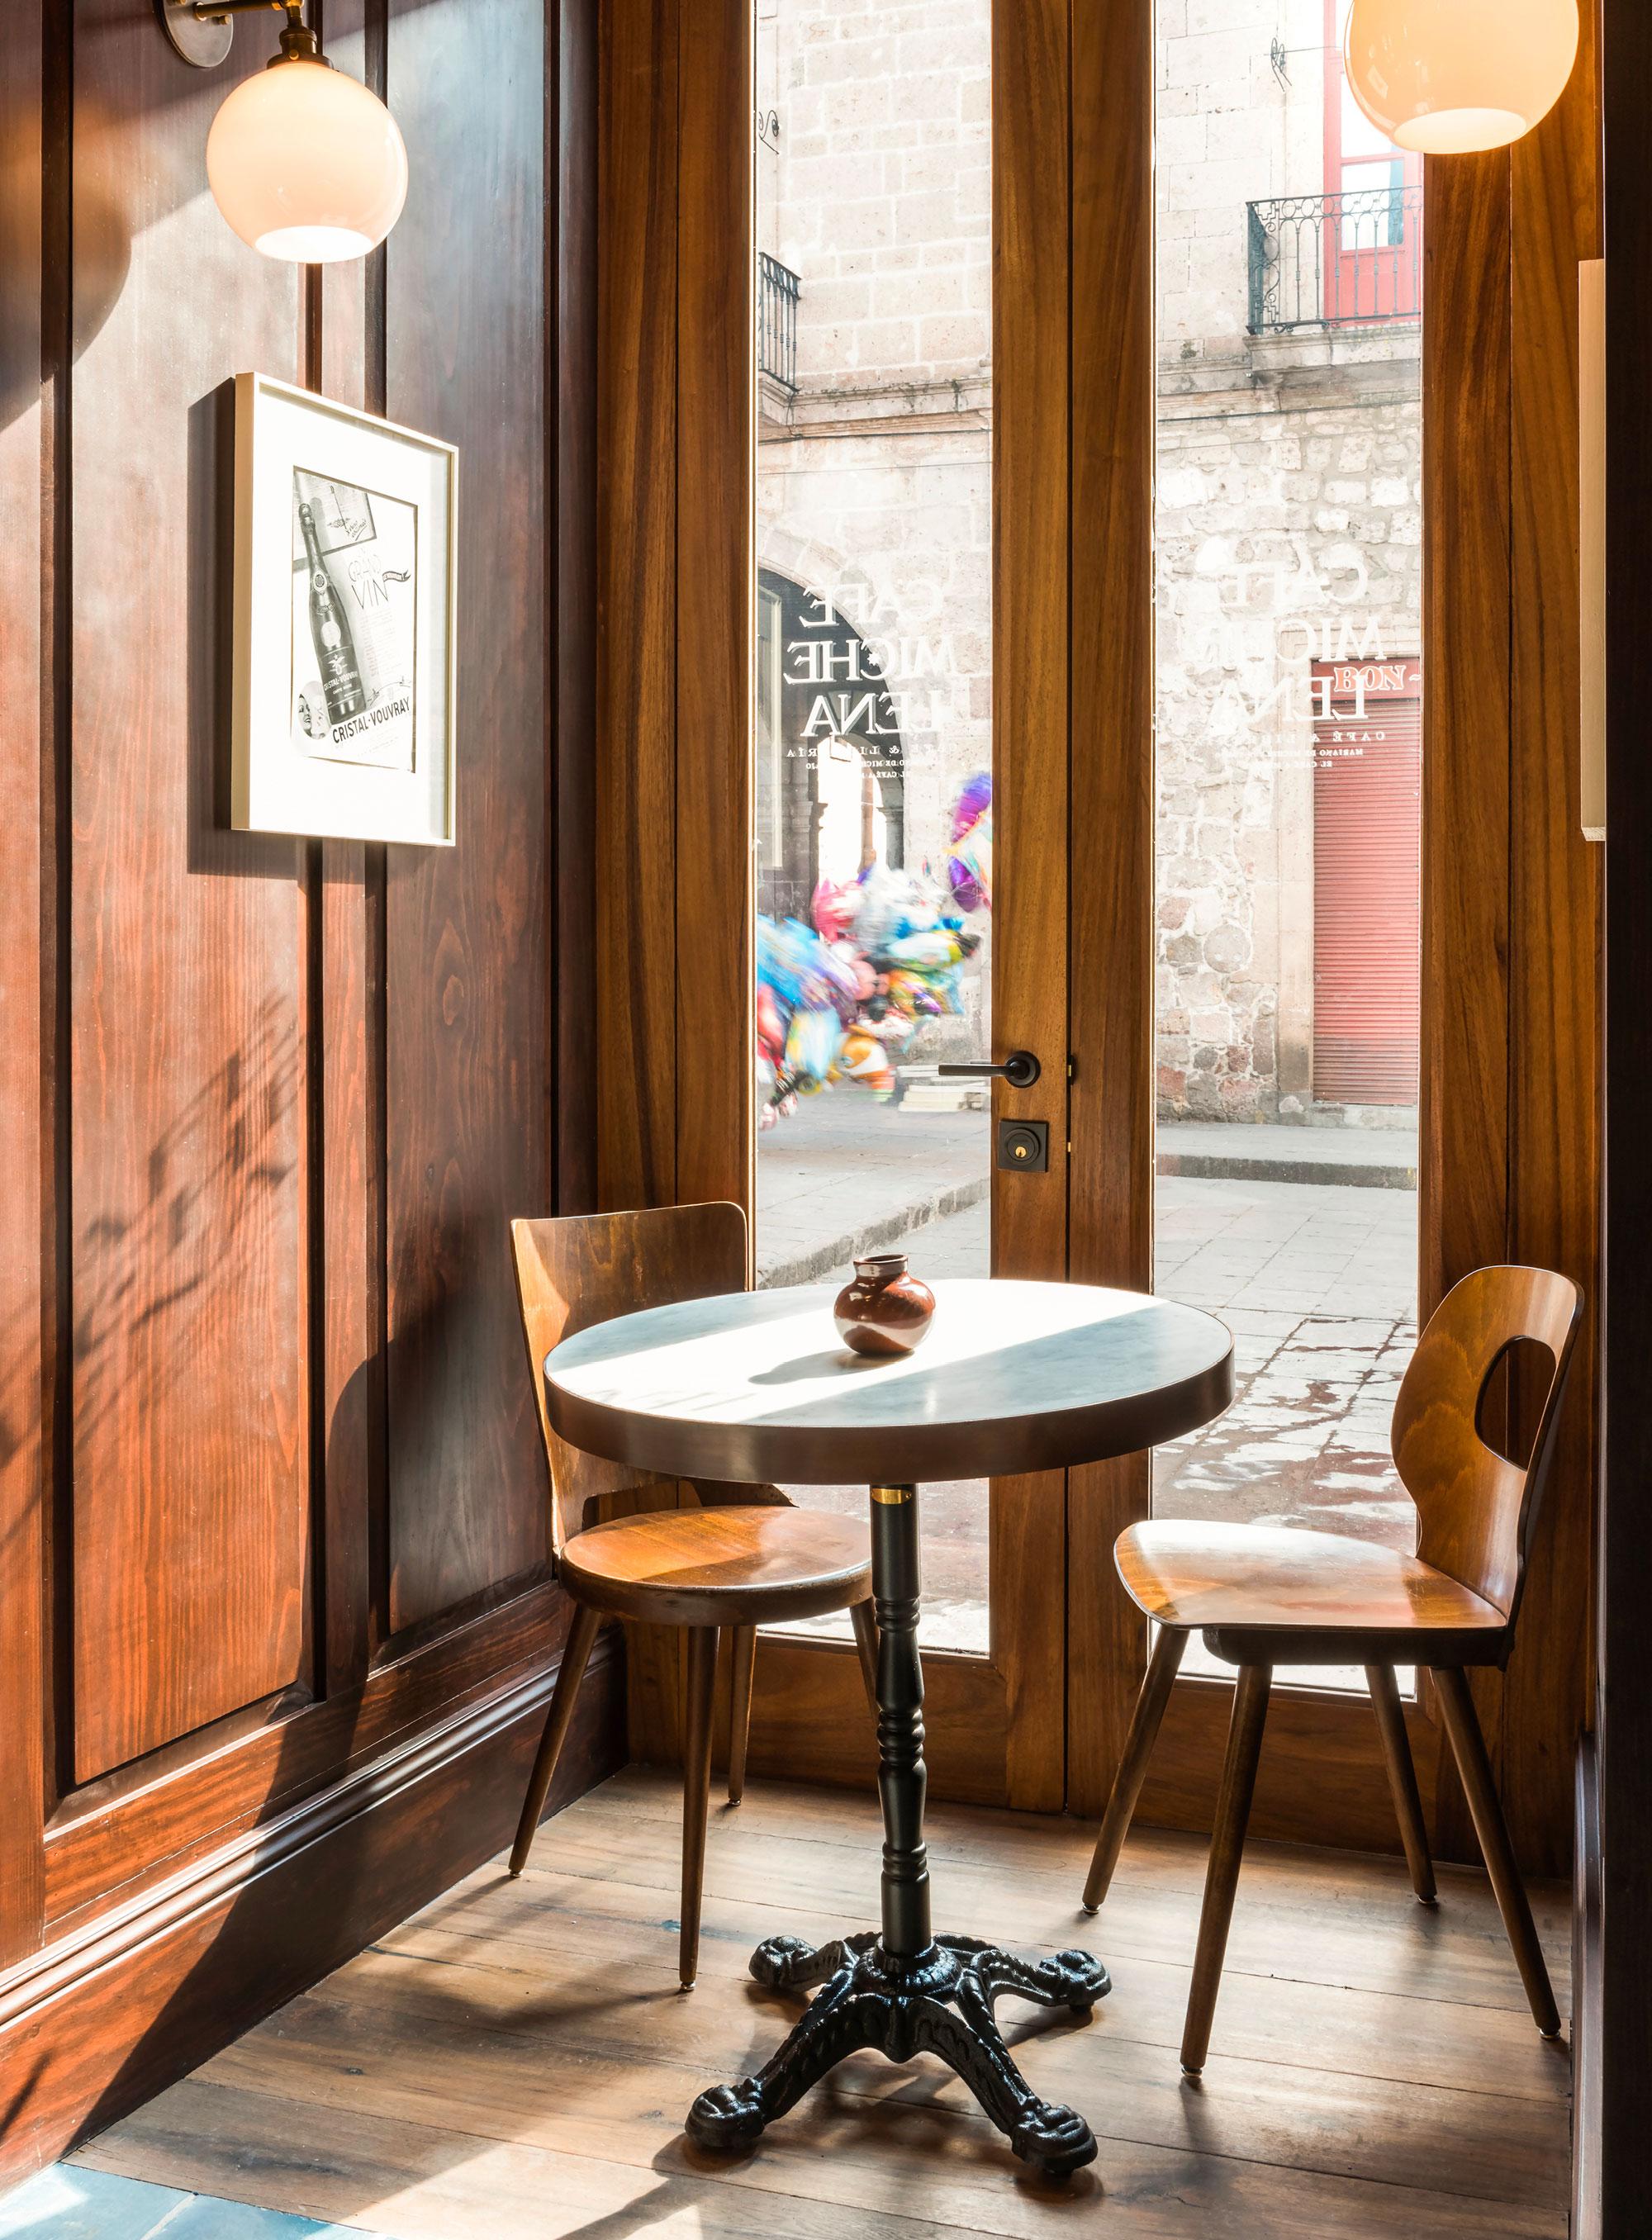 luis_laplace-Cafe_Michelena_Morelia-5